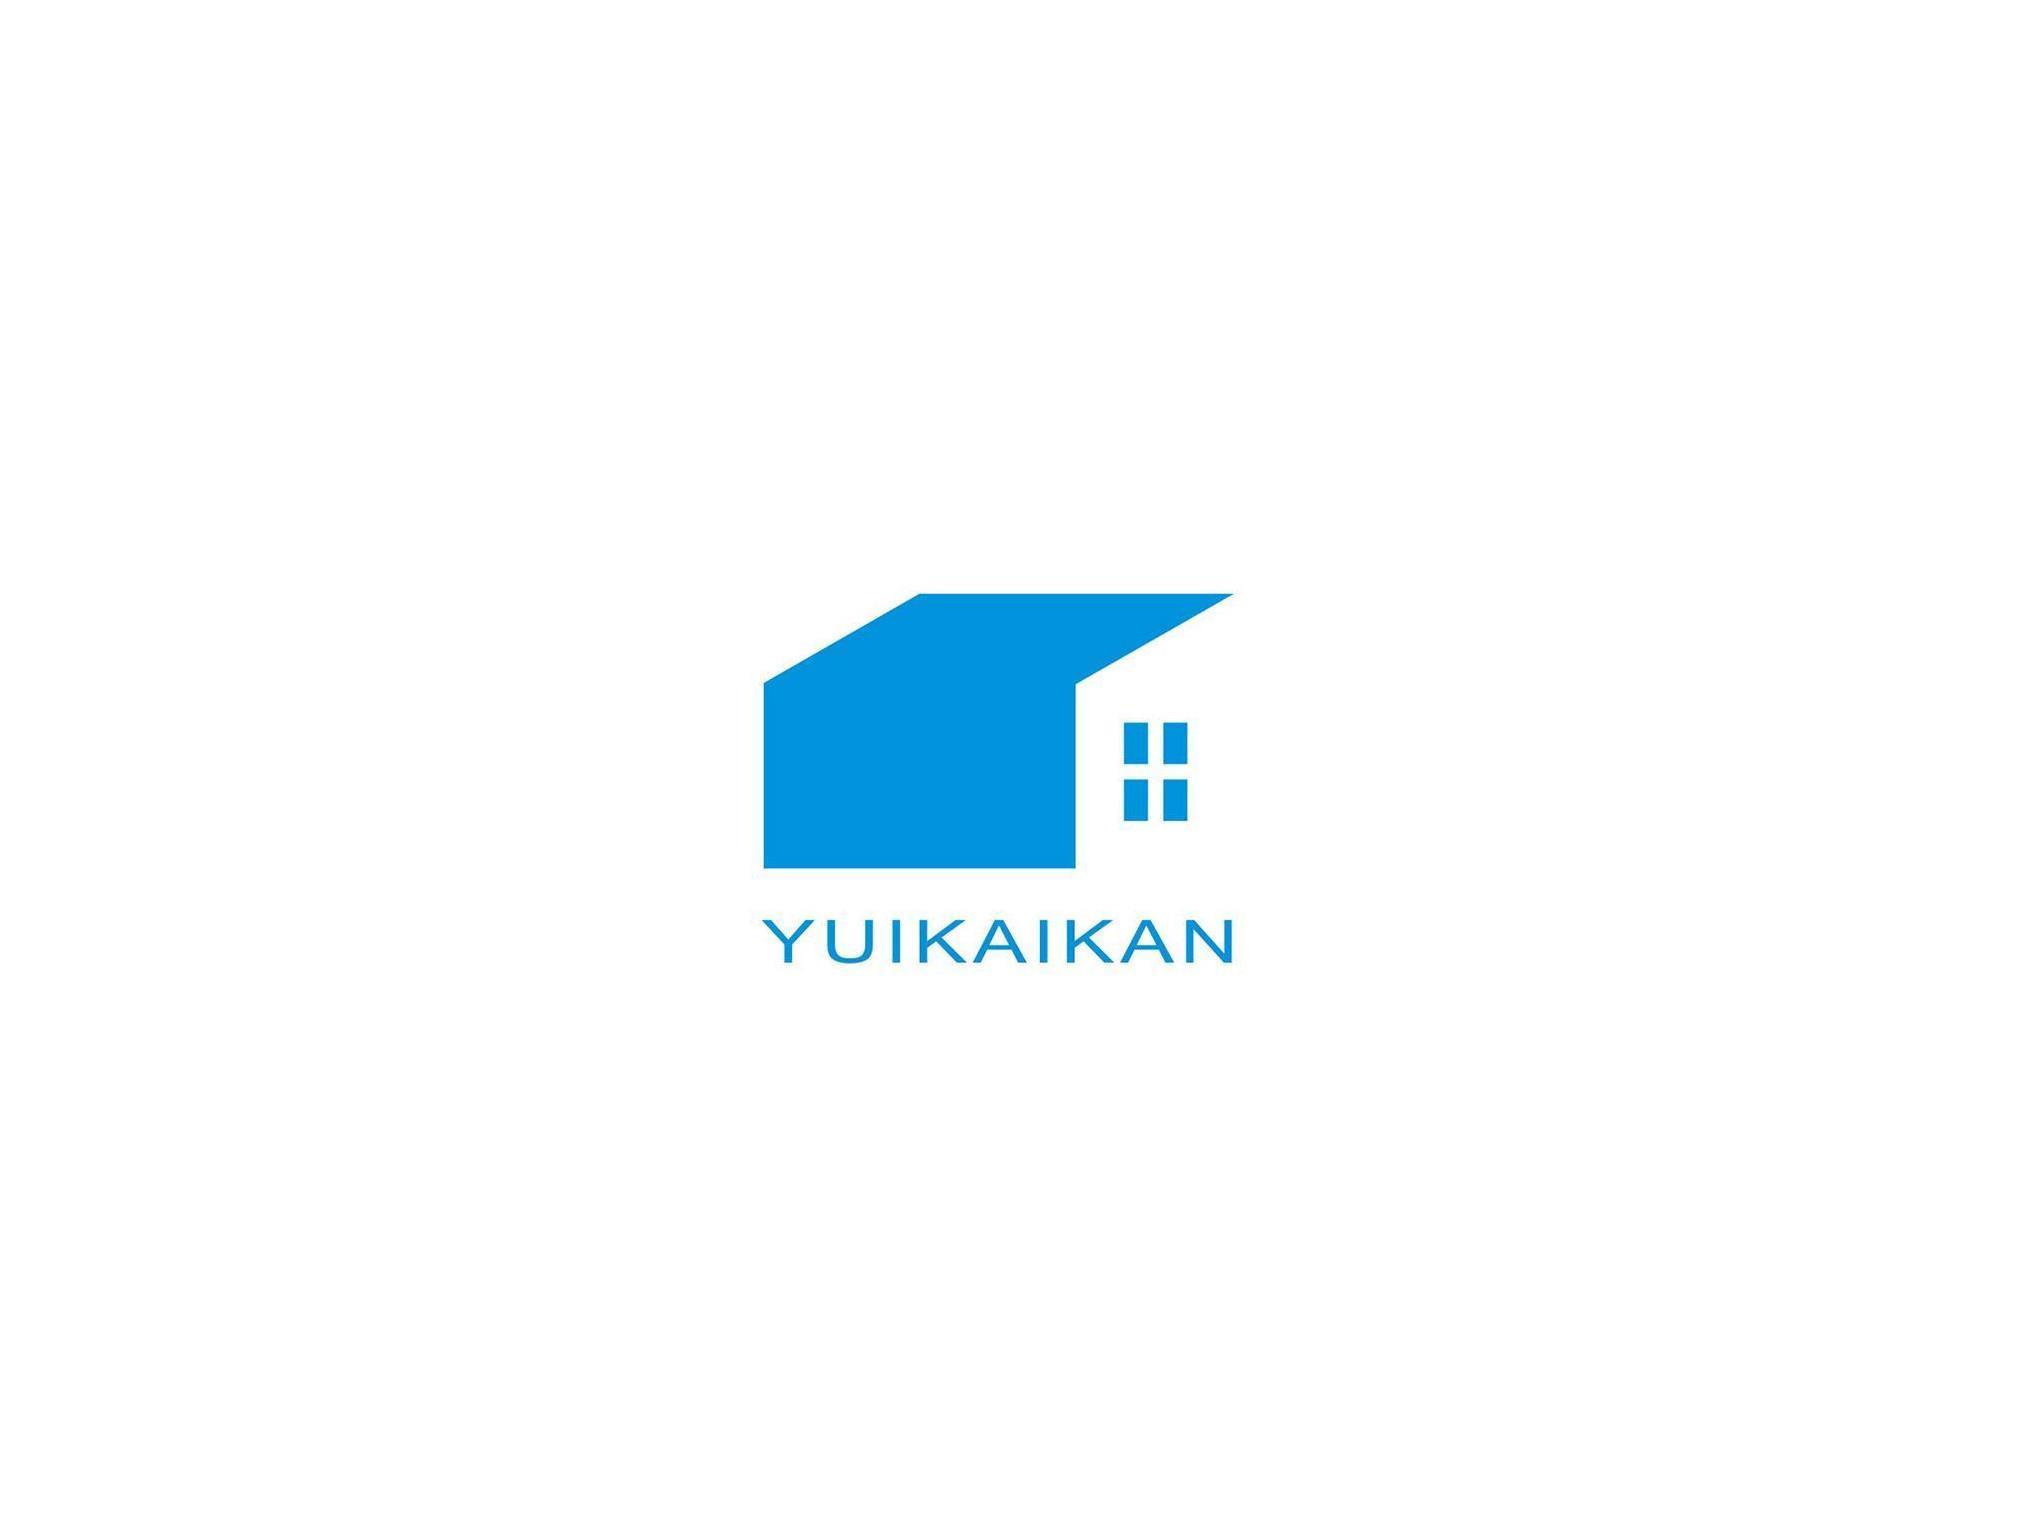 Yui Kaikan